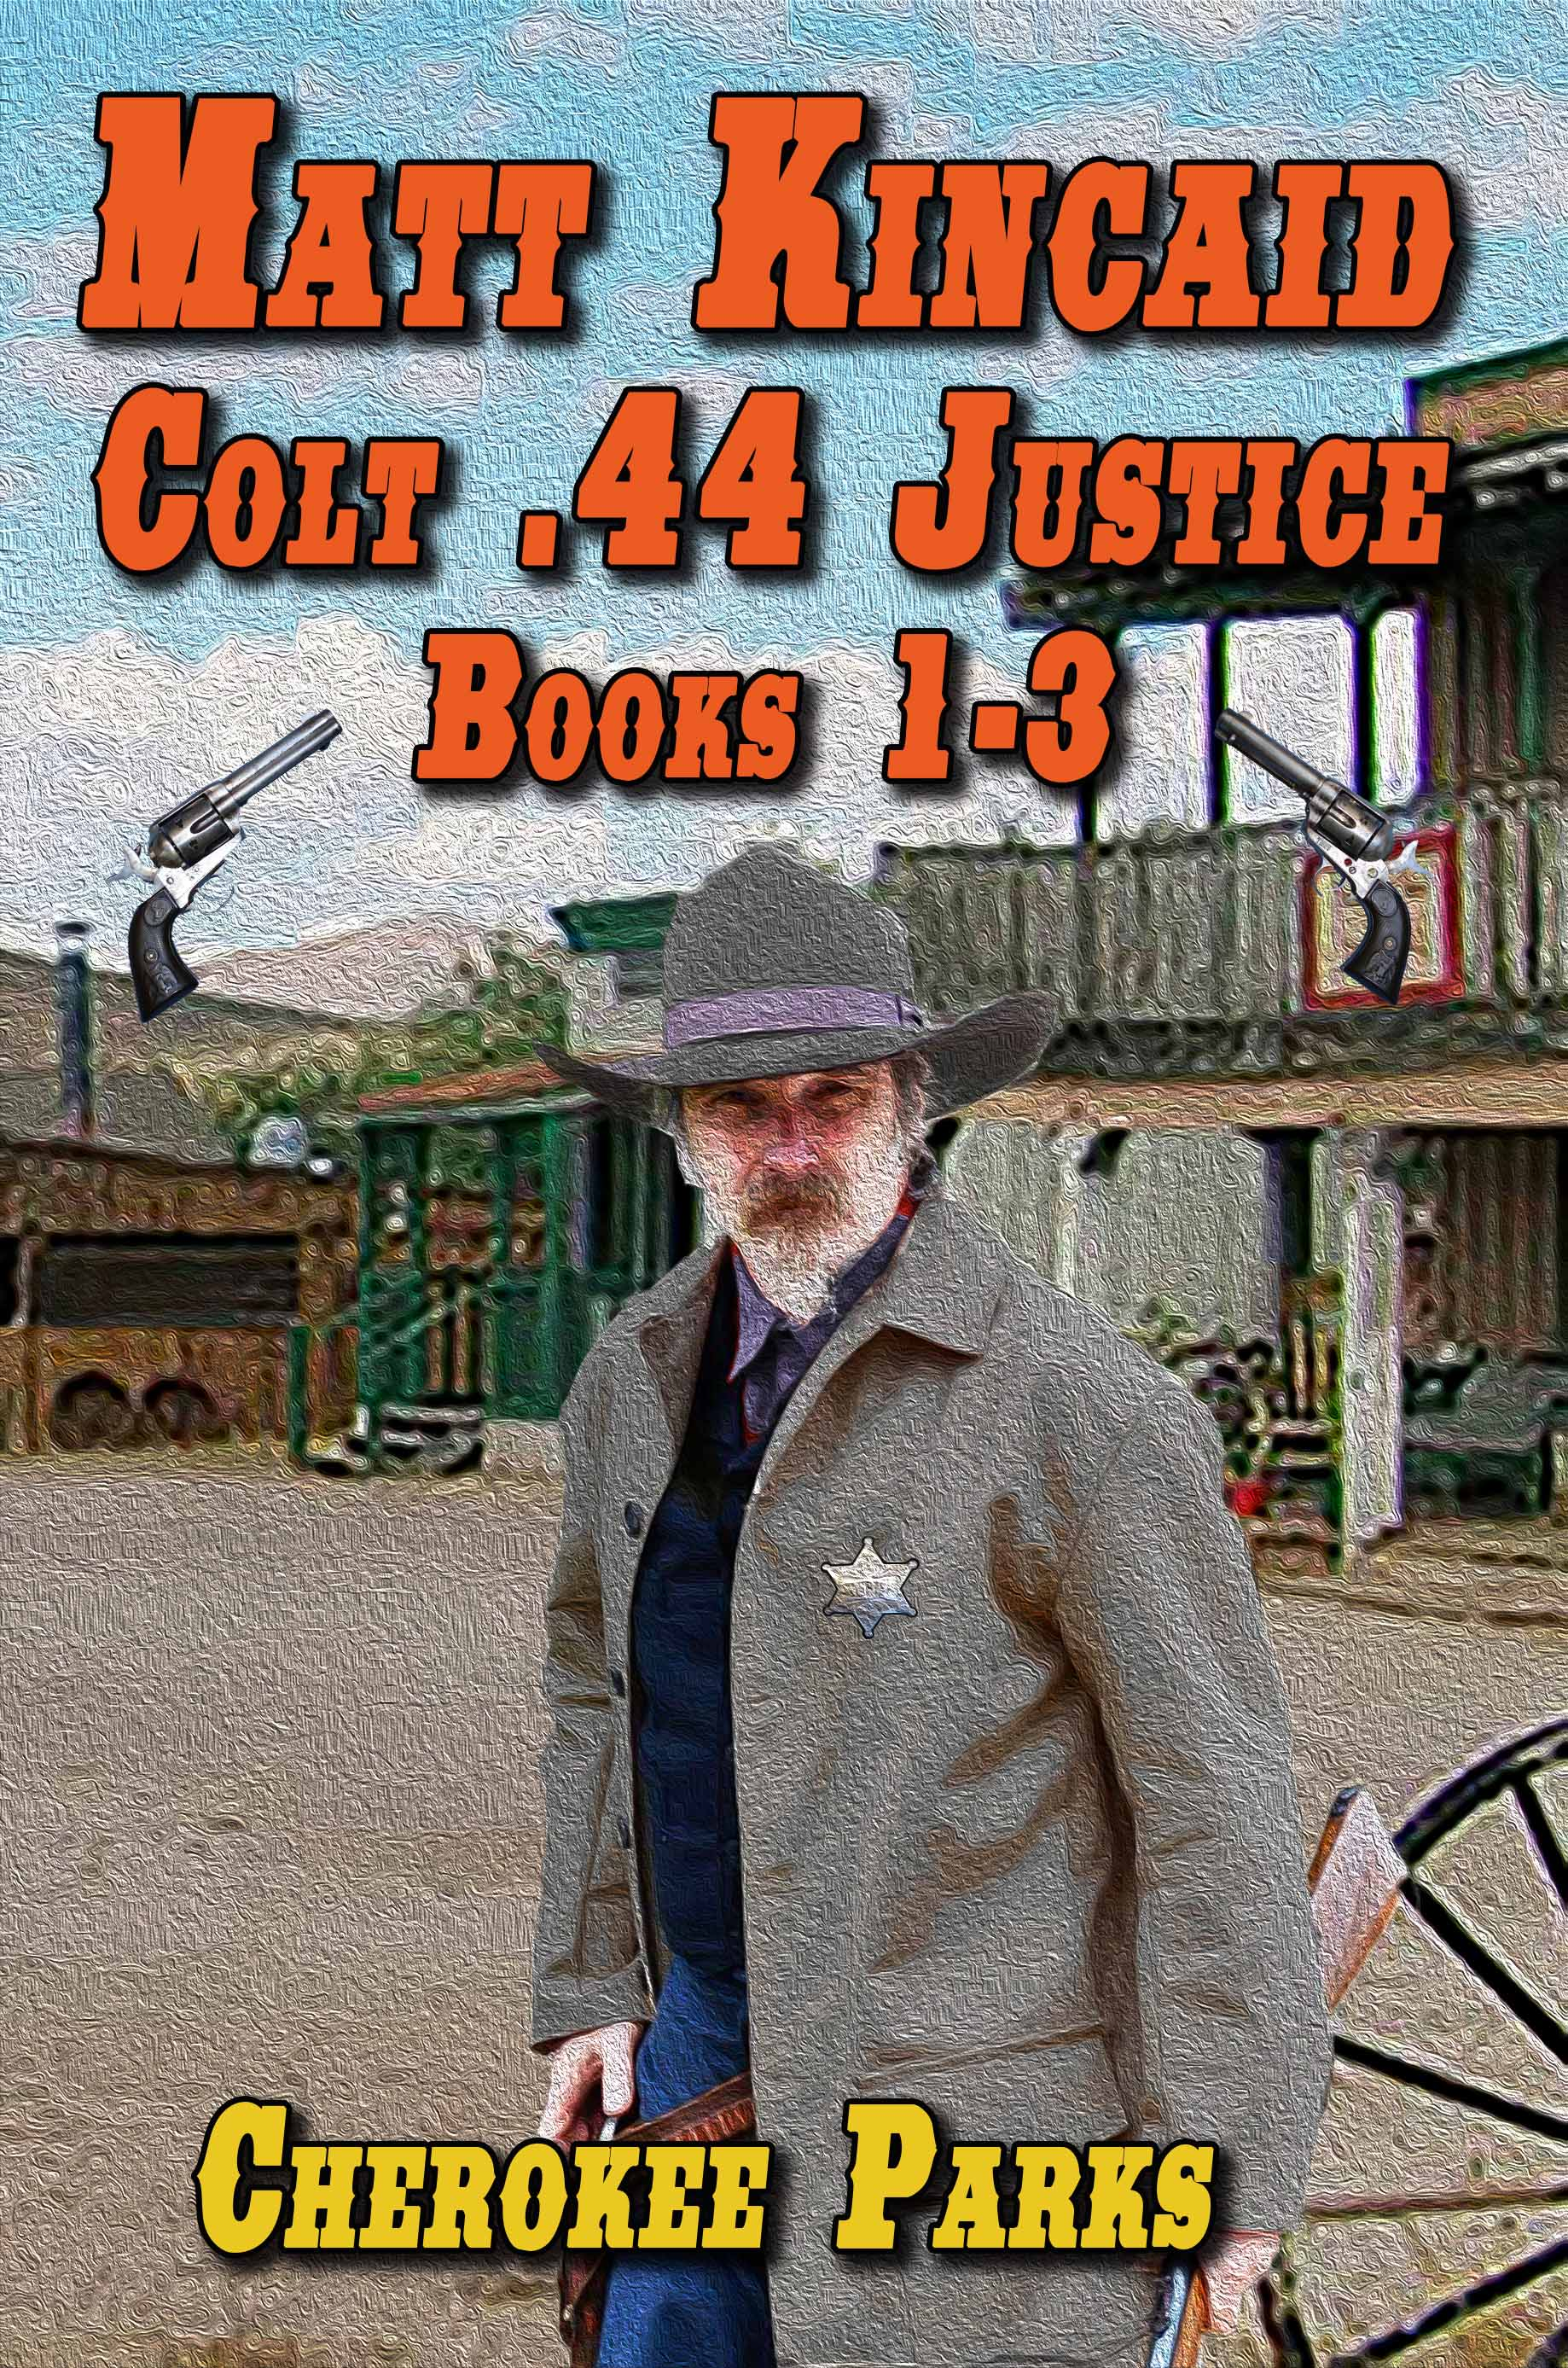 Matt Kincaid: Colt .44 Justice